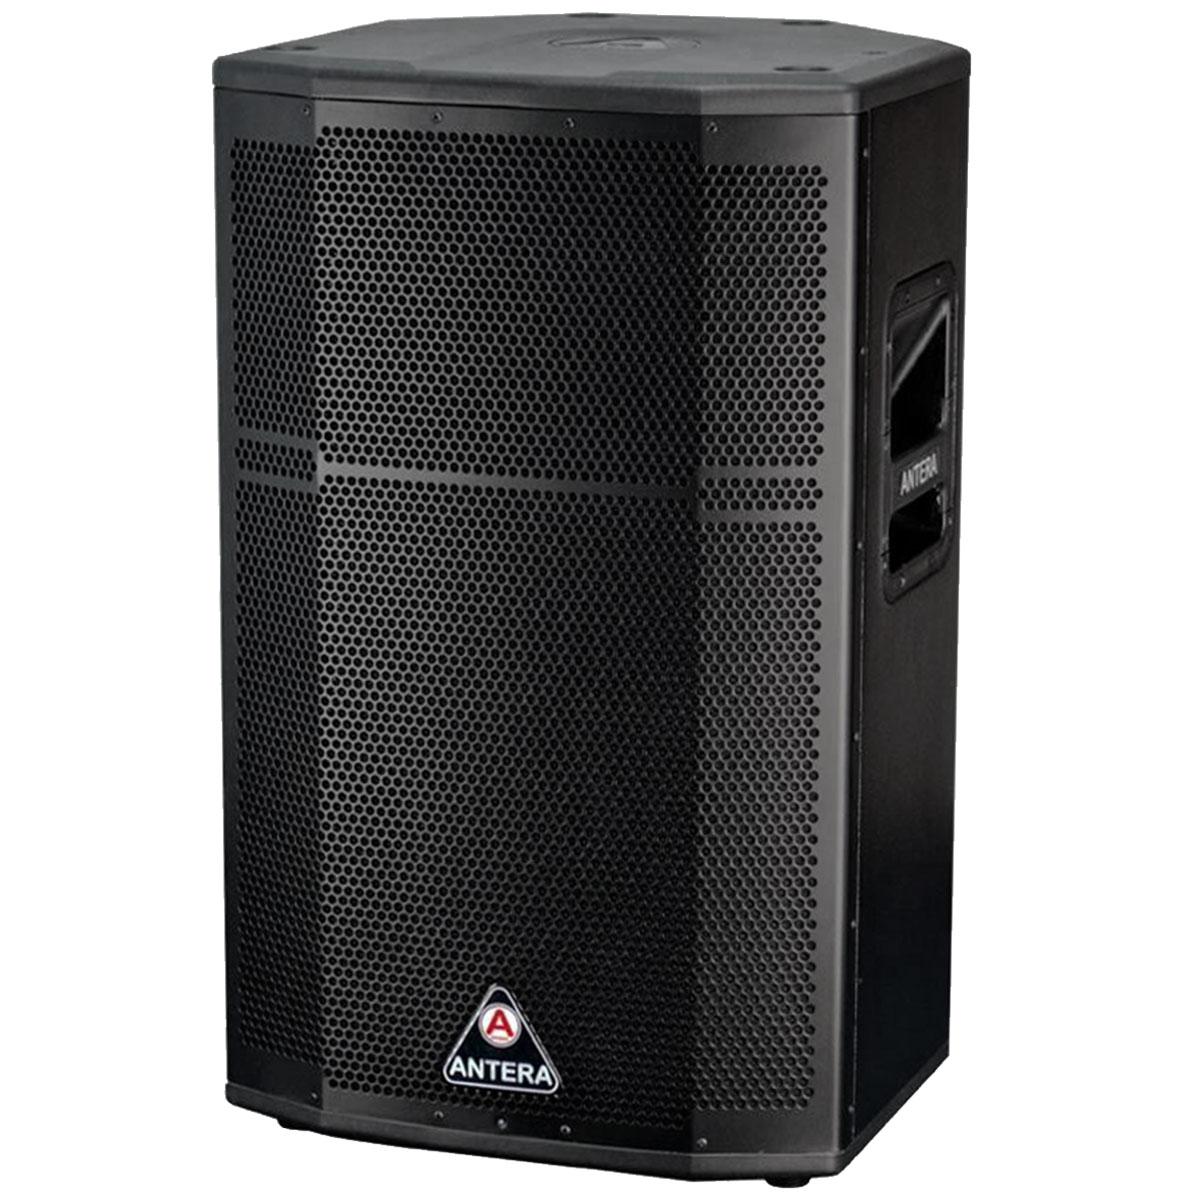 Caixa Ativa 500W Preta HPS15A - Antera